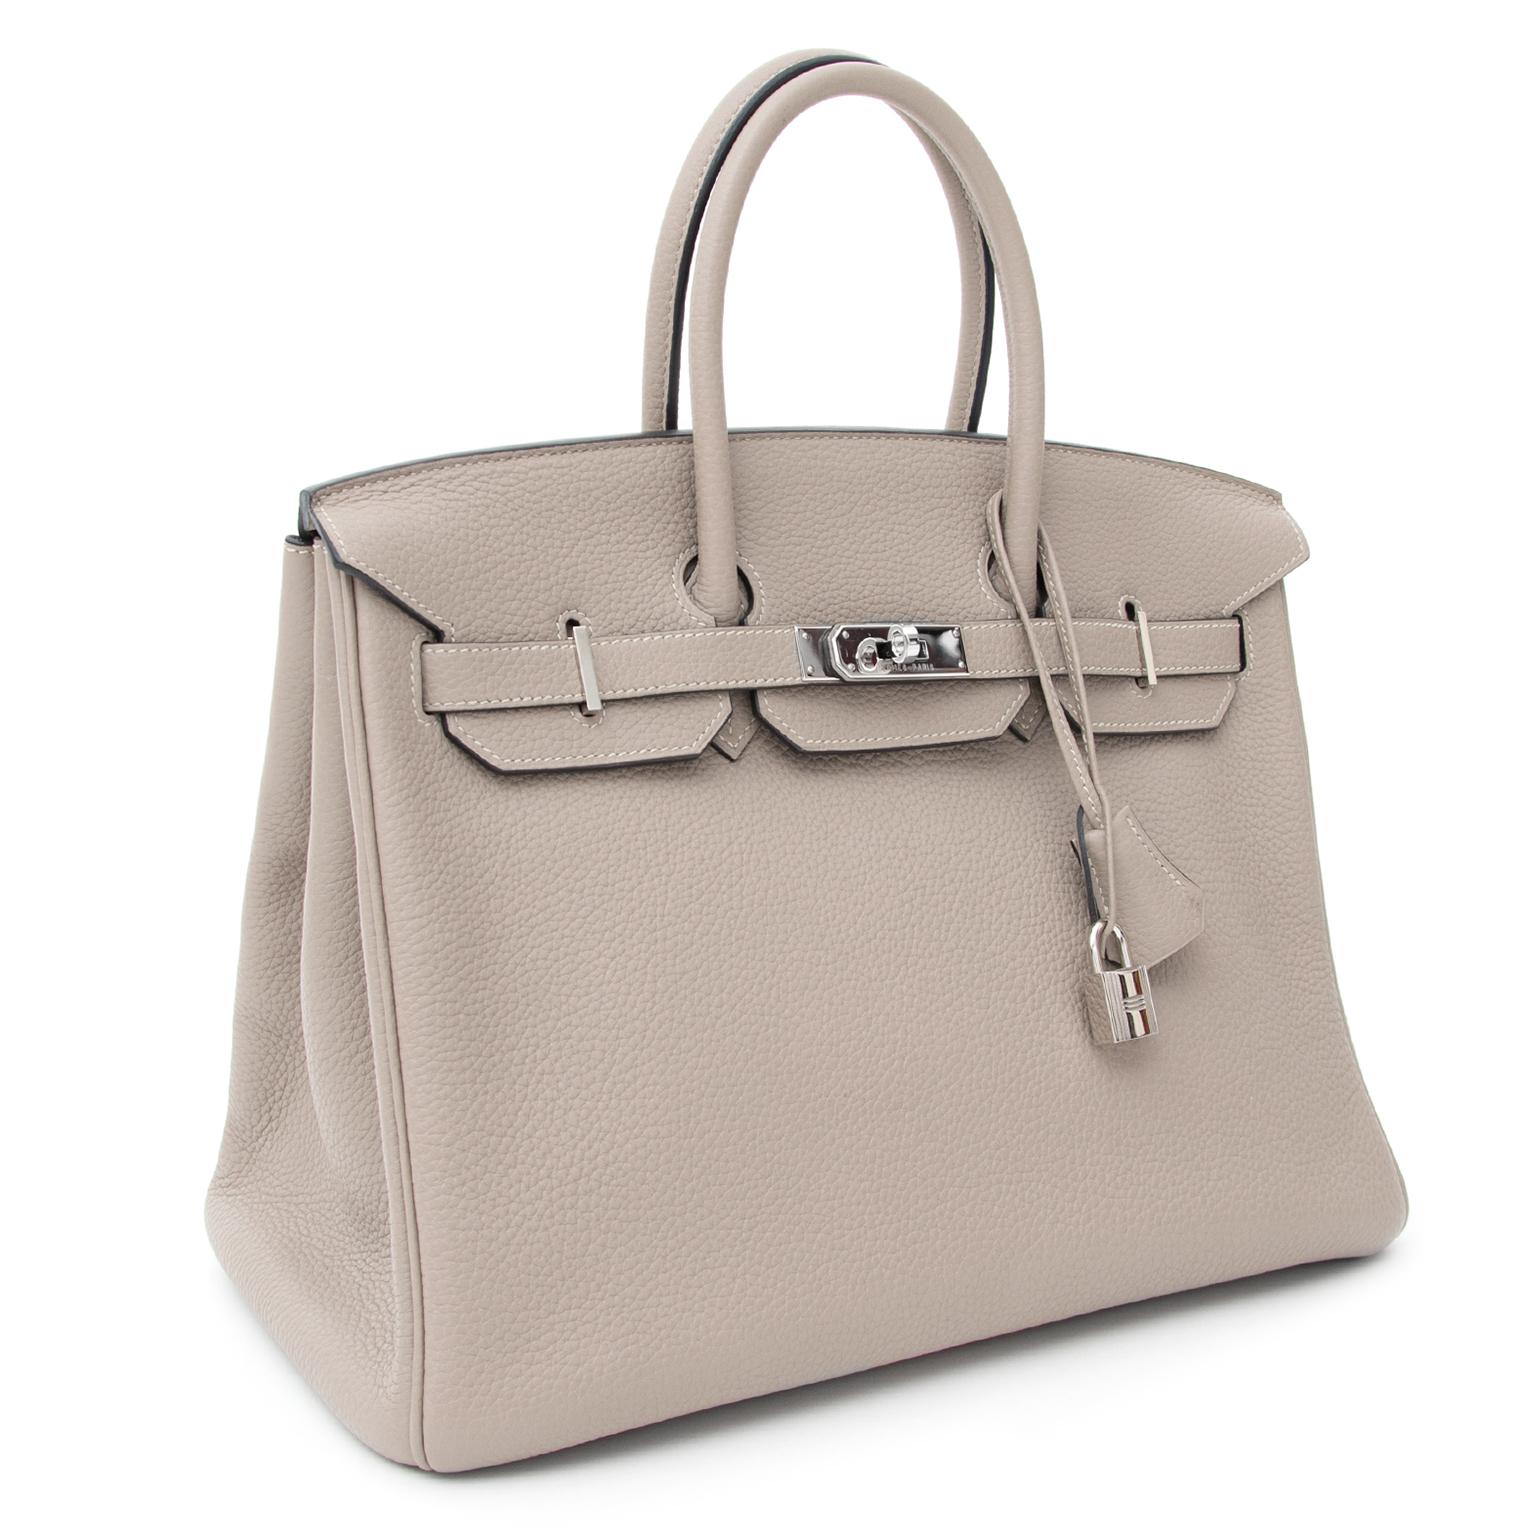 ... seconde main en ligne acheter prix correcte Hermès Birkin Gris  Tourterelle 35 Togo PHW tweedehands hermes handtassen authentiek certifié b0d6d025749